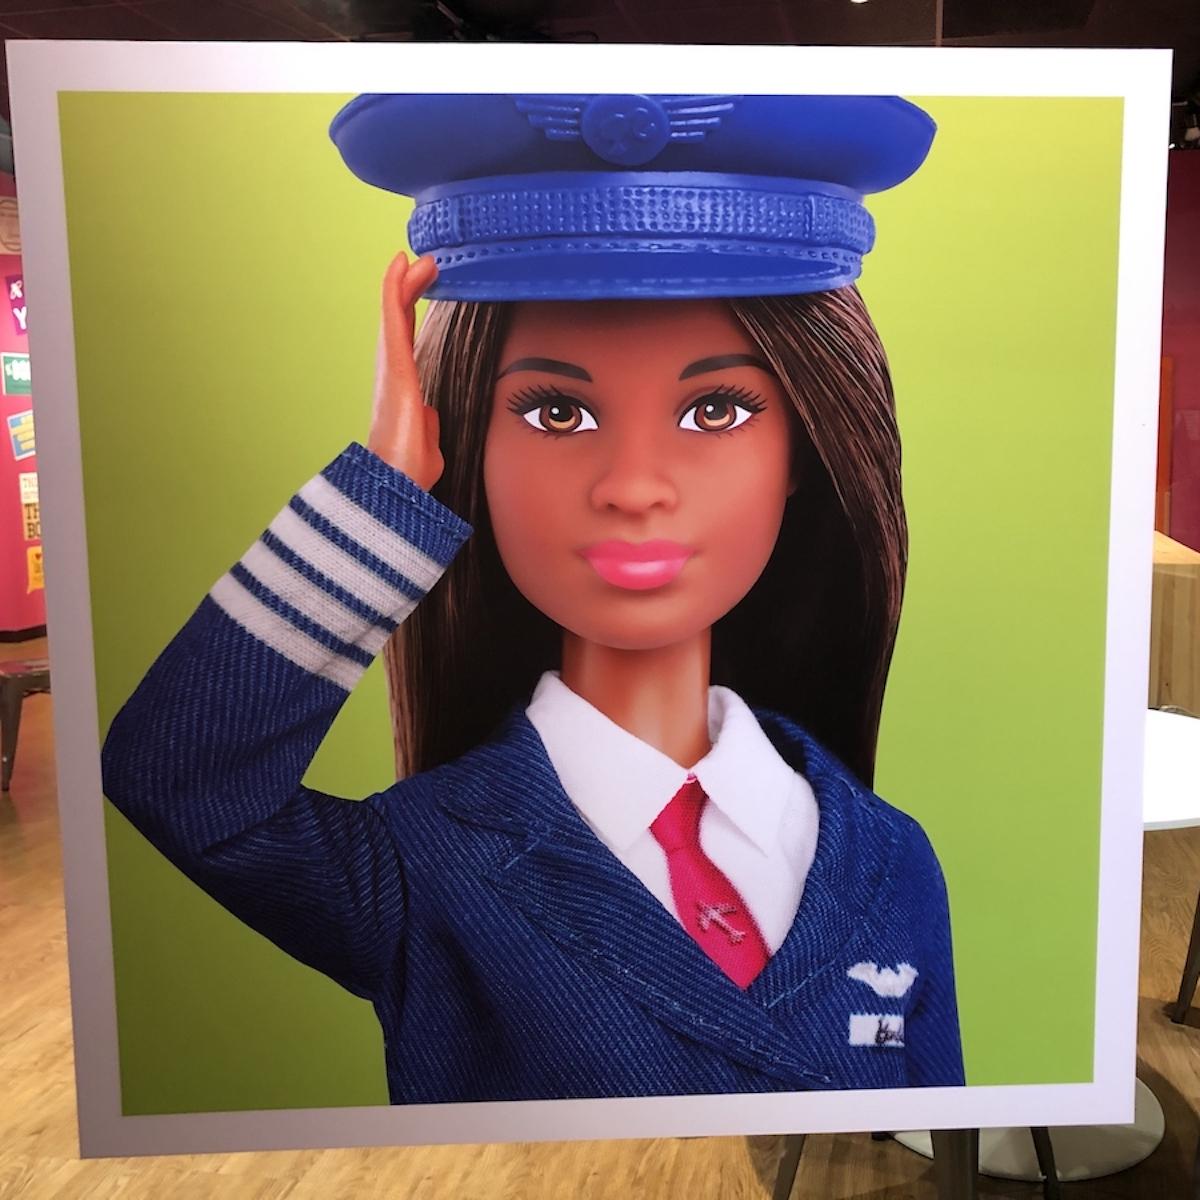 Barbie as a pilot, poster.